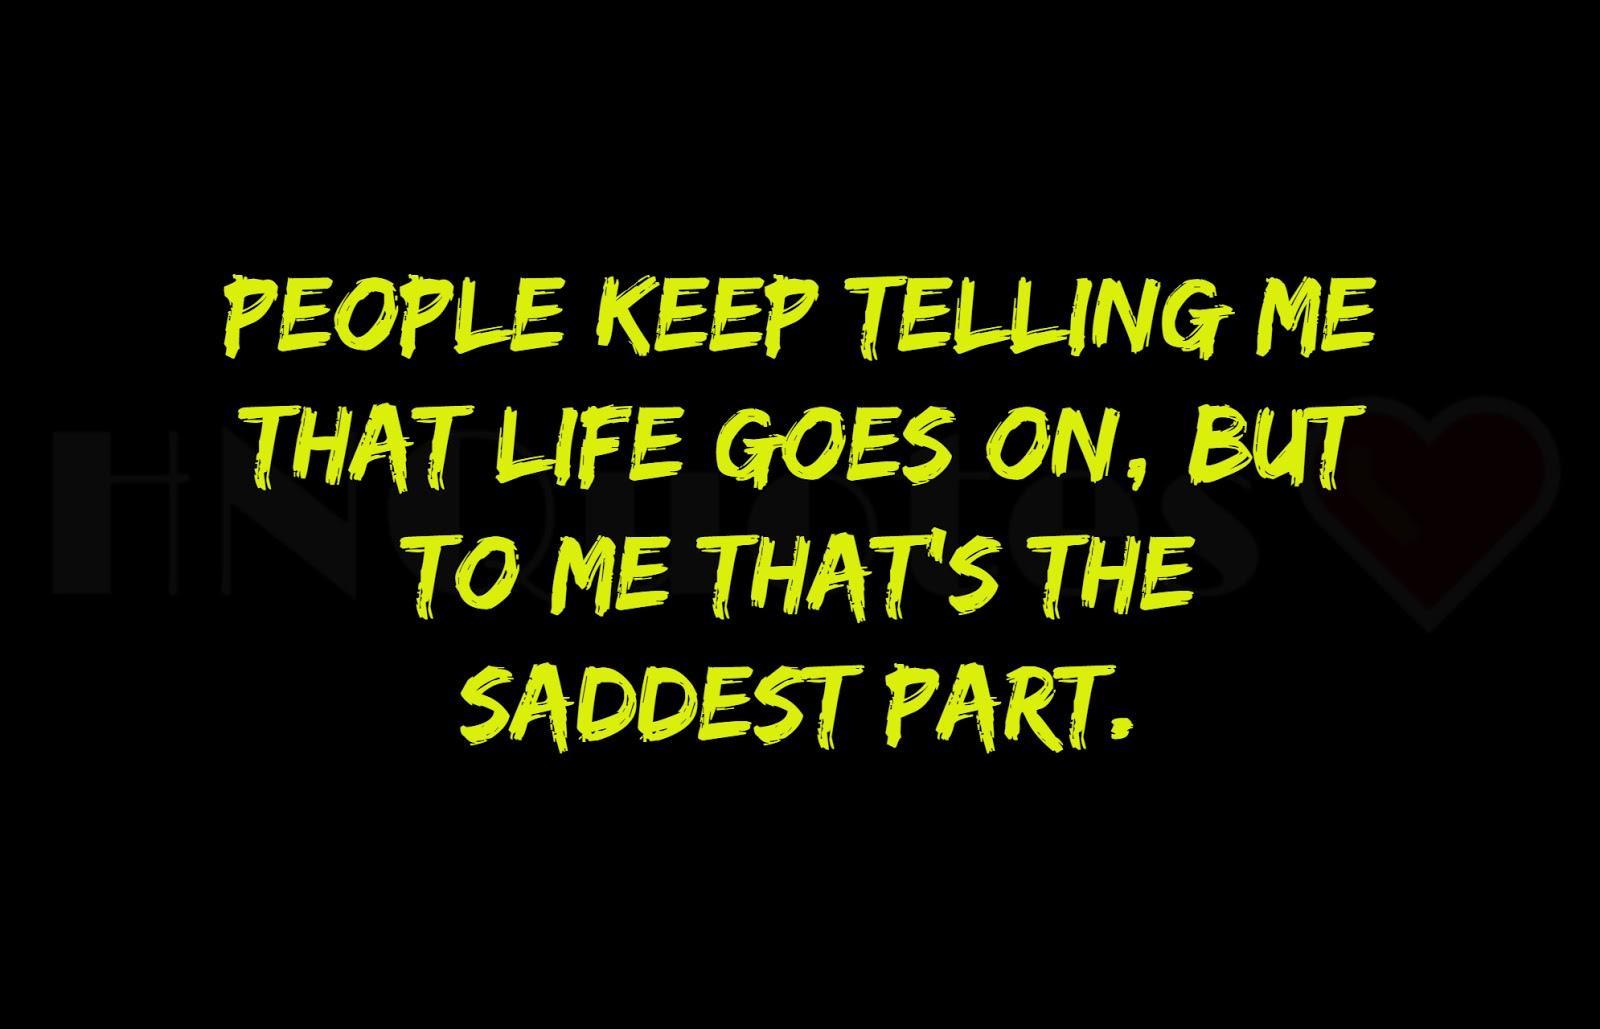 [Sad]-Quotes-on-Life-35-[HNQuotes]